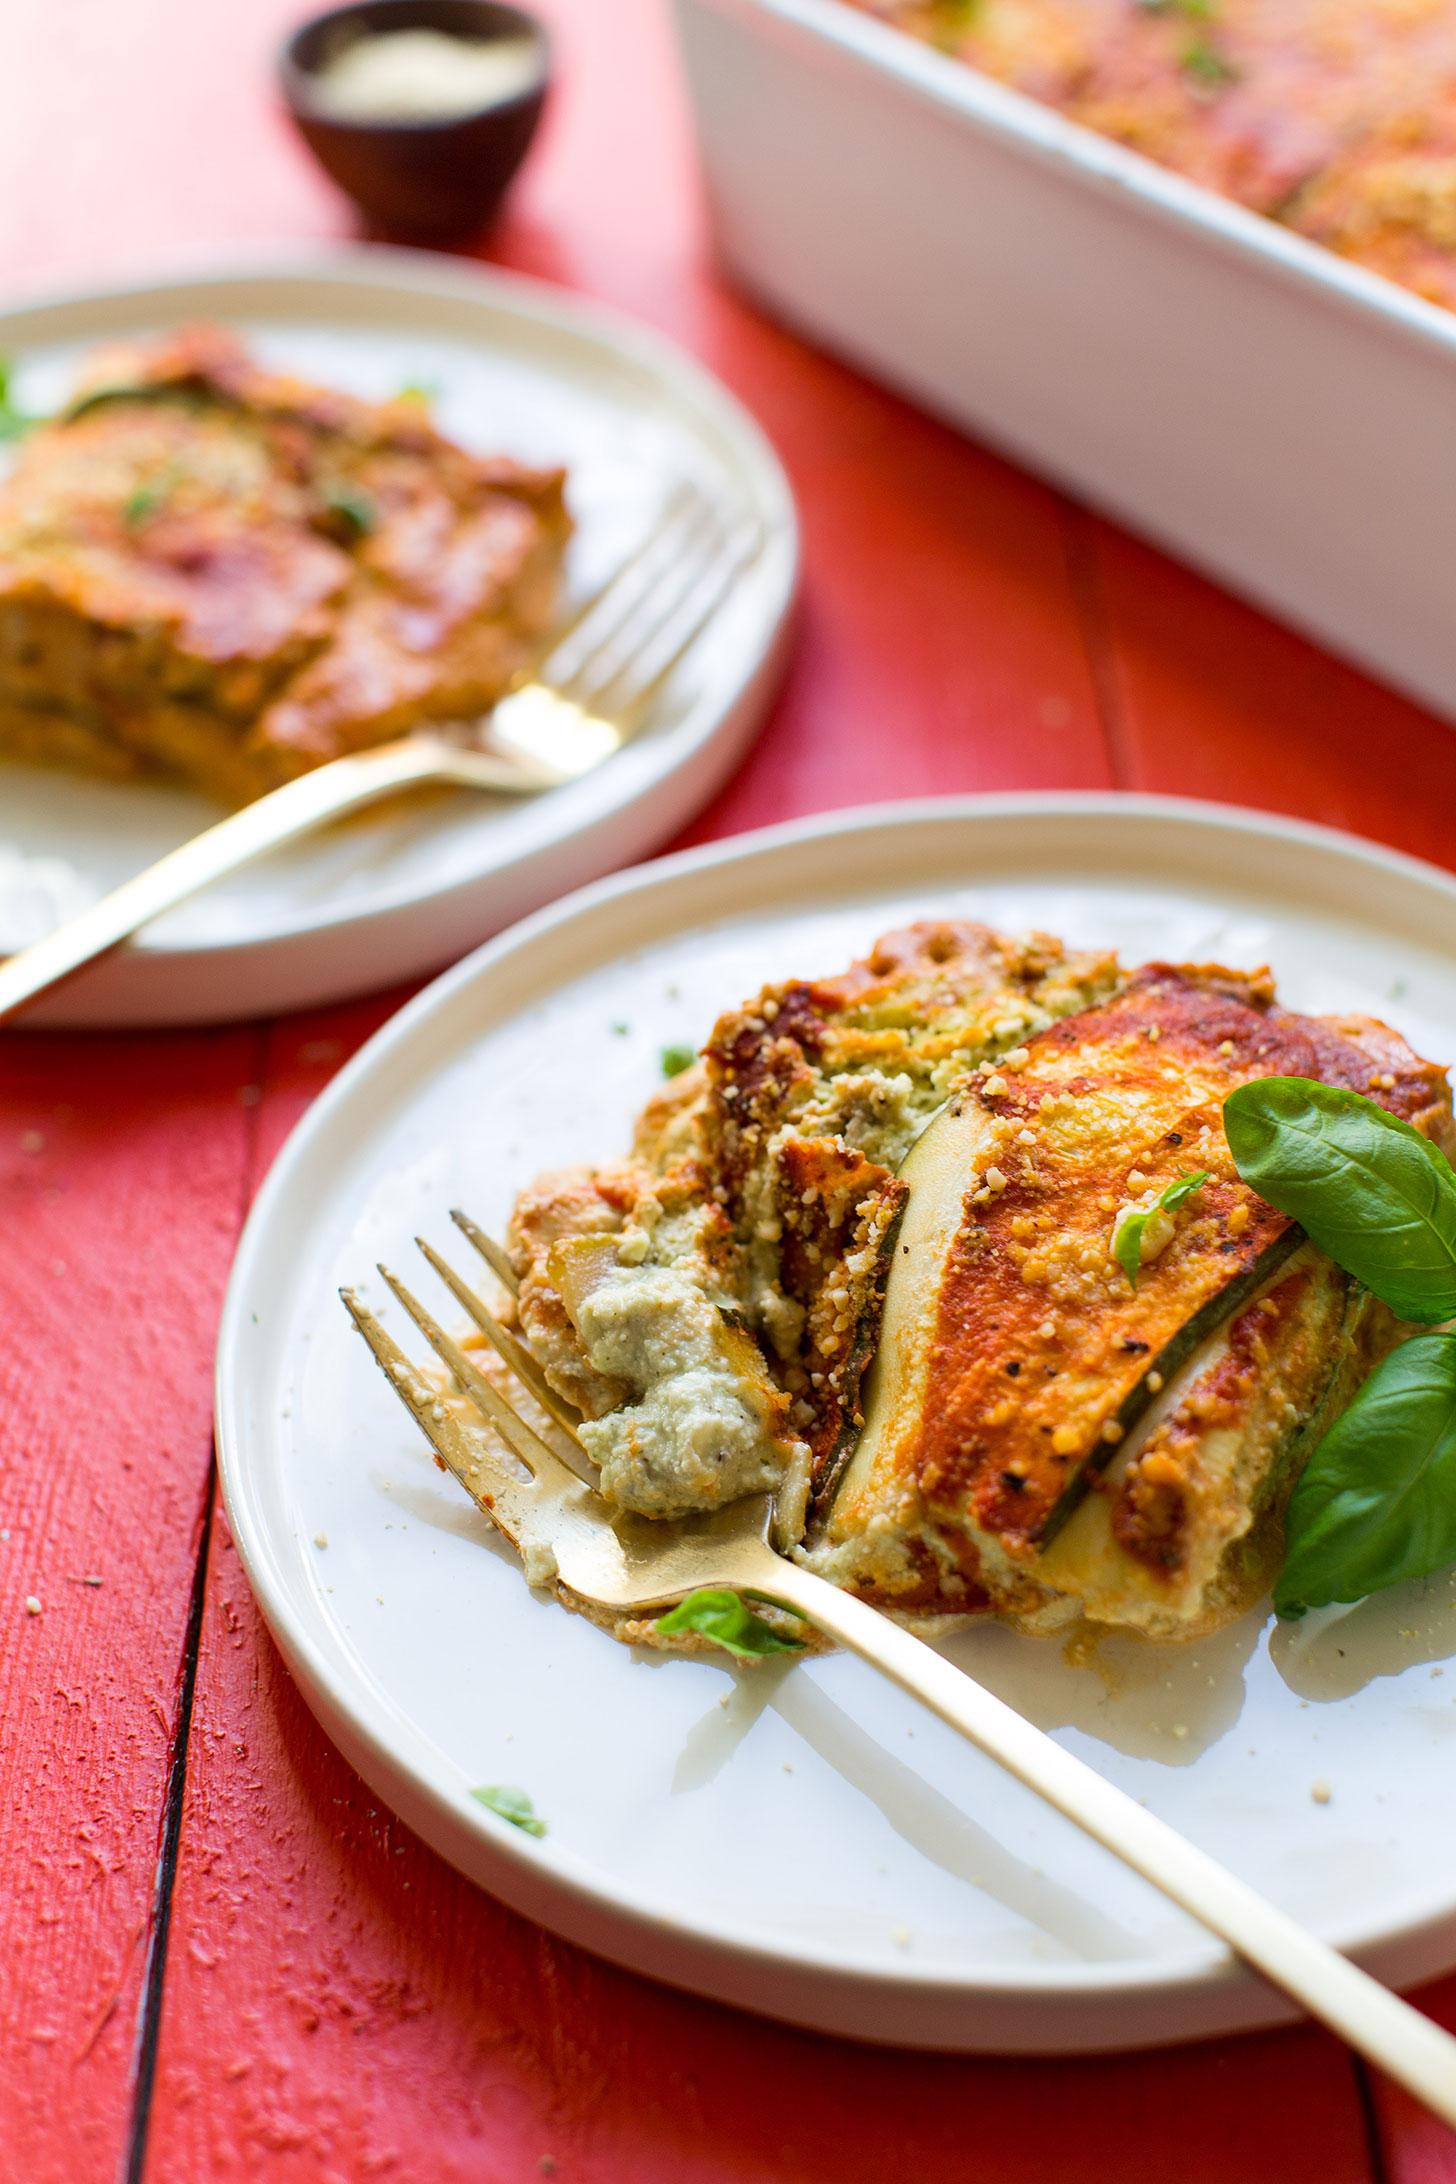 Gluten-Free Vegan Zucchini Lasagna